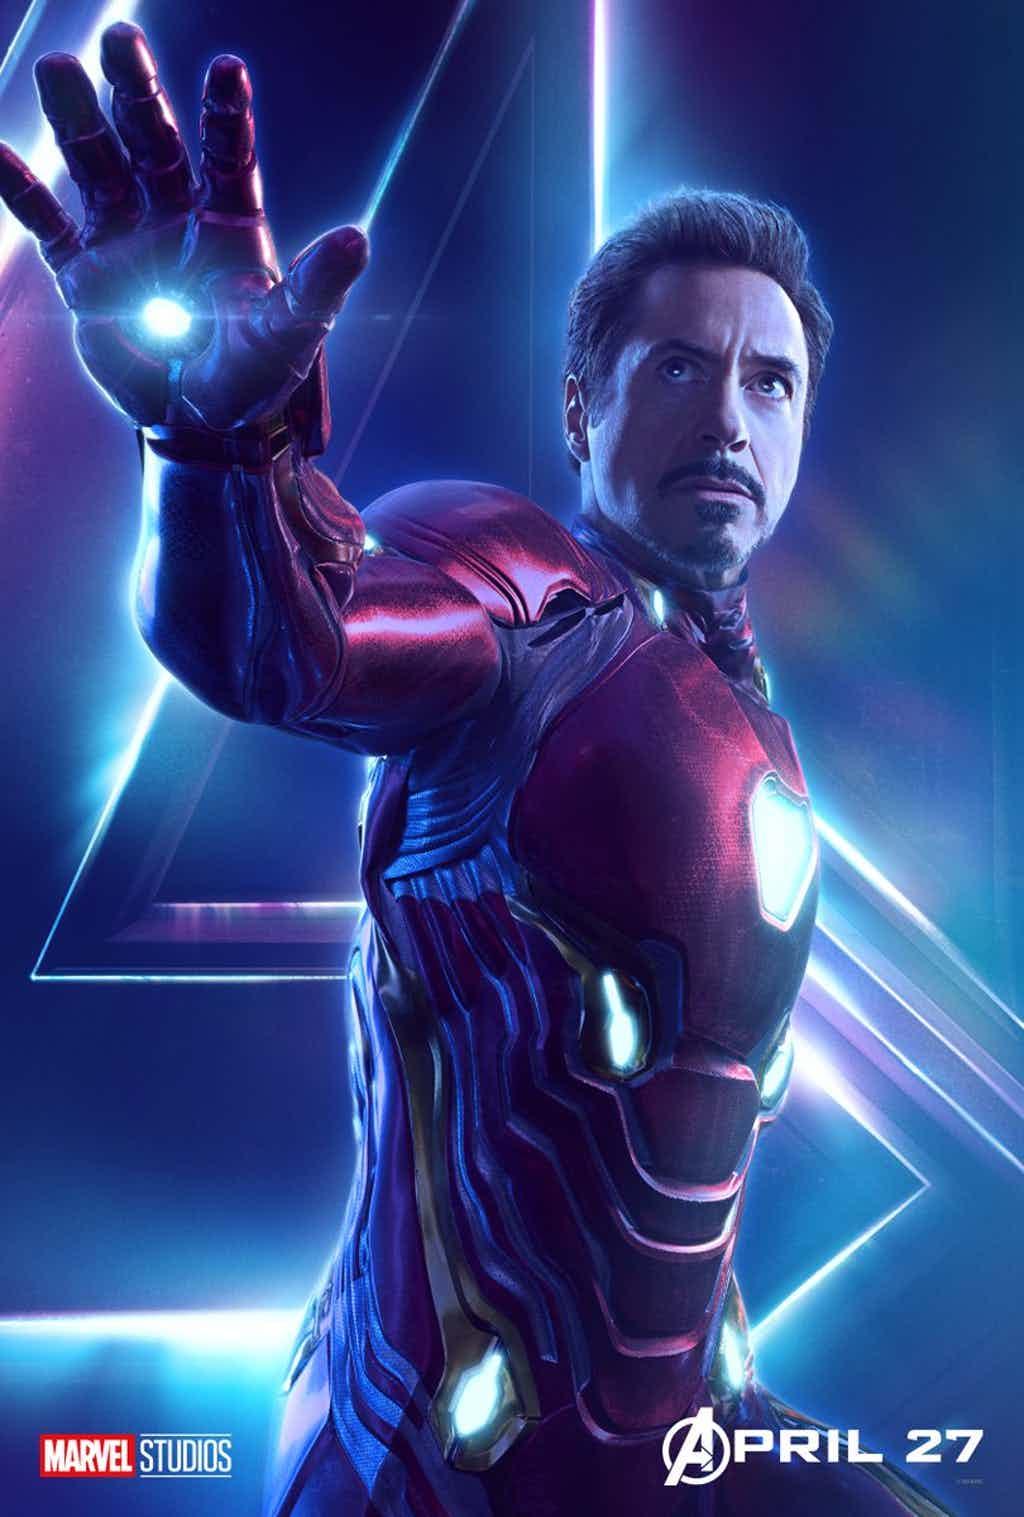 szmk_marvel_infinity_war_vegtelen_haboru_bosszuallok_avengers_ironman_hulk_thor_captainamaerica_guardians_galaxy_8.jpg